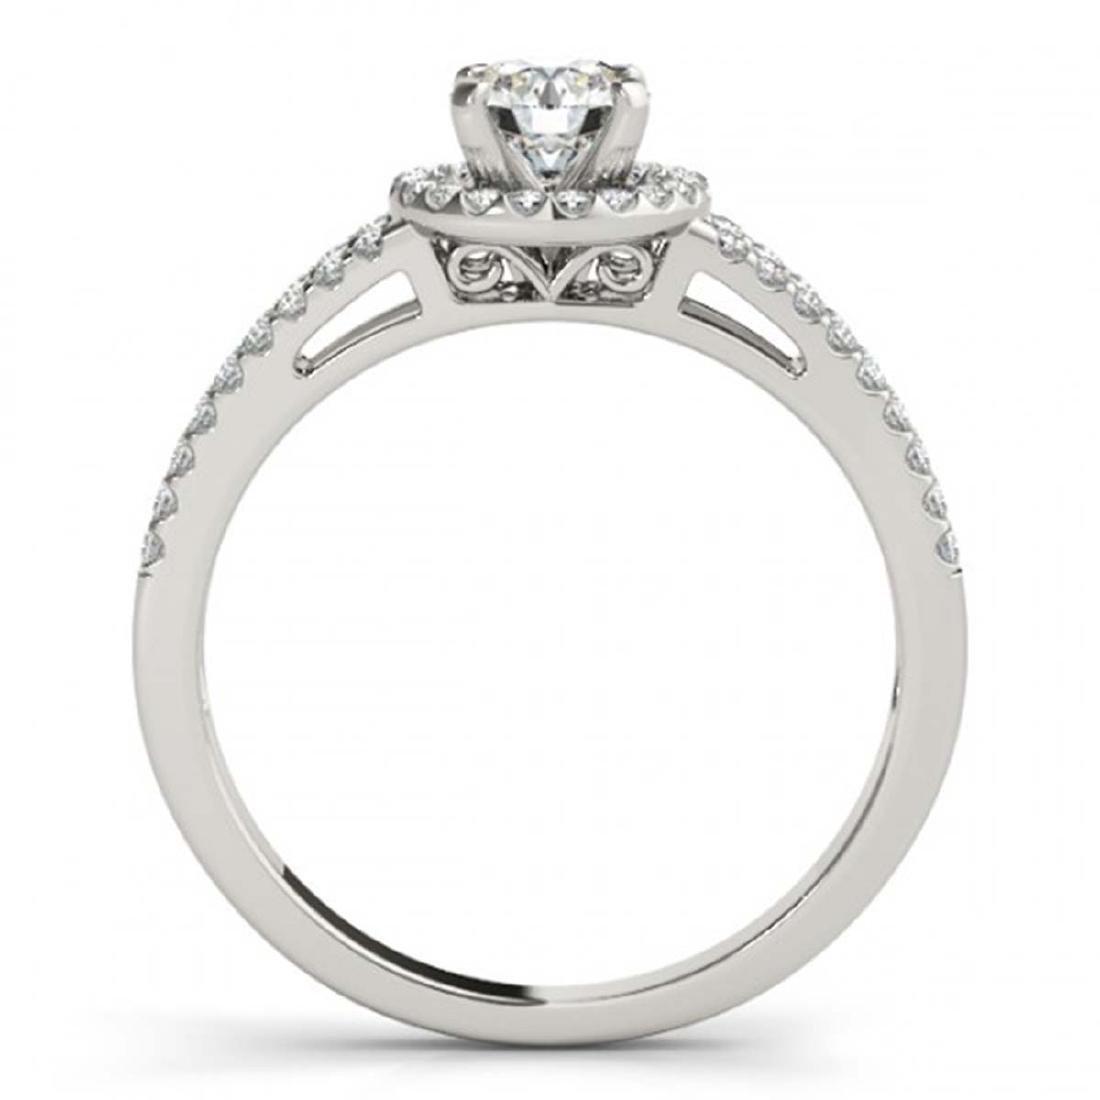 0.75 CTW VS/SI Diamond Solitaire Halo Ring 14K White - 2